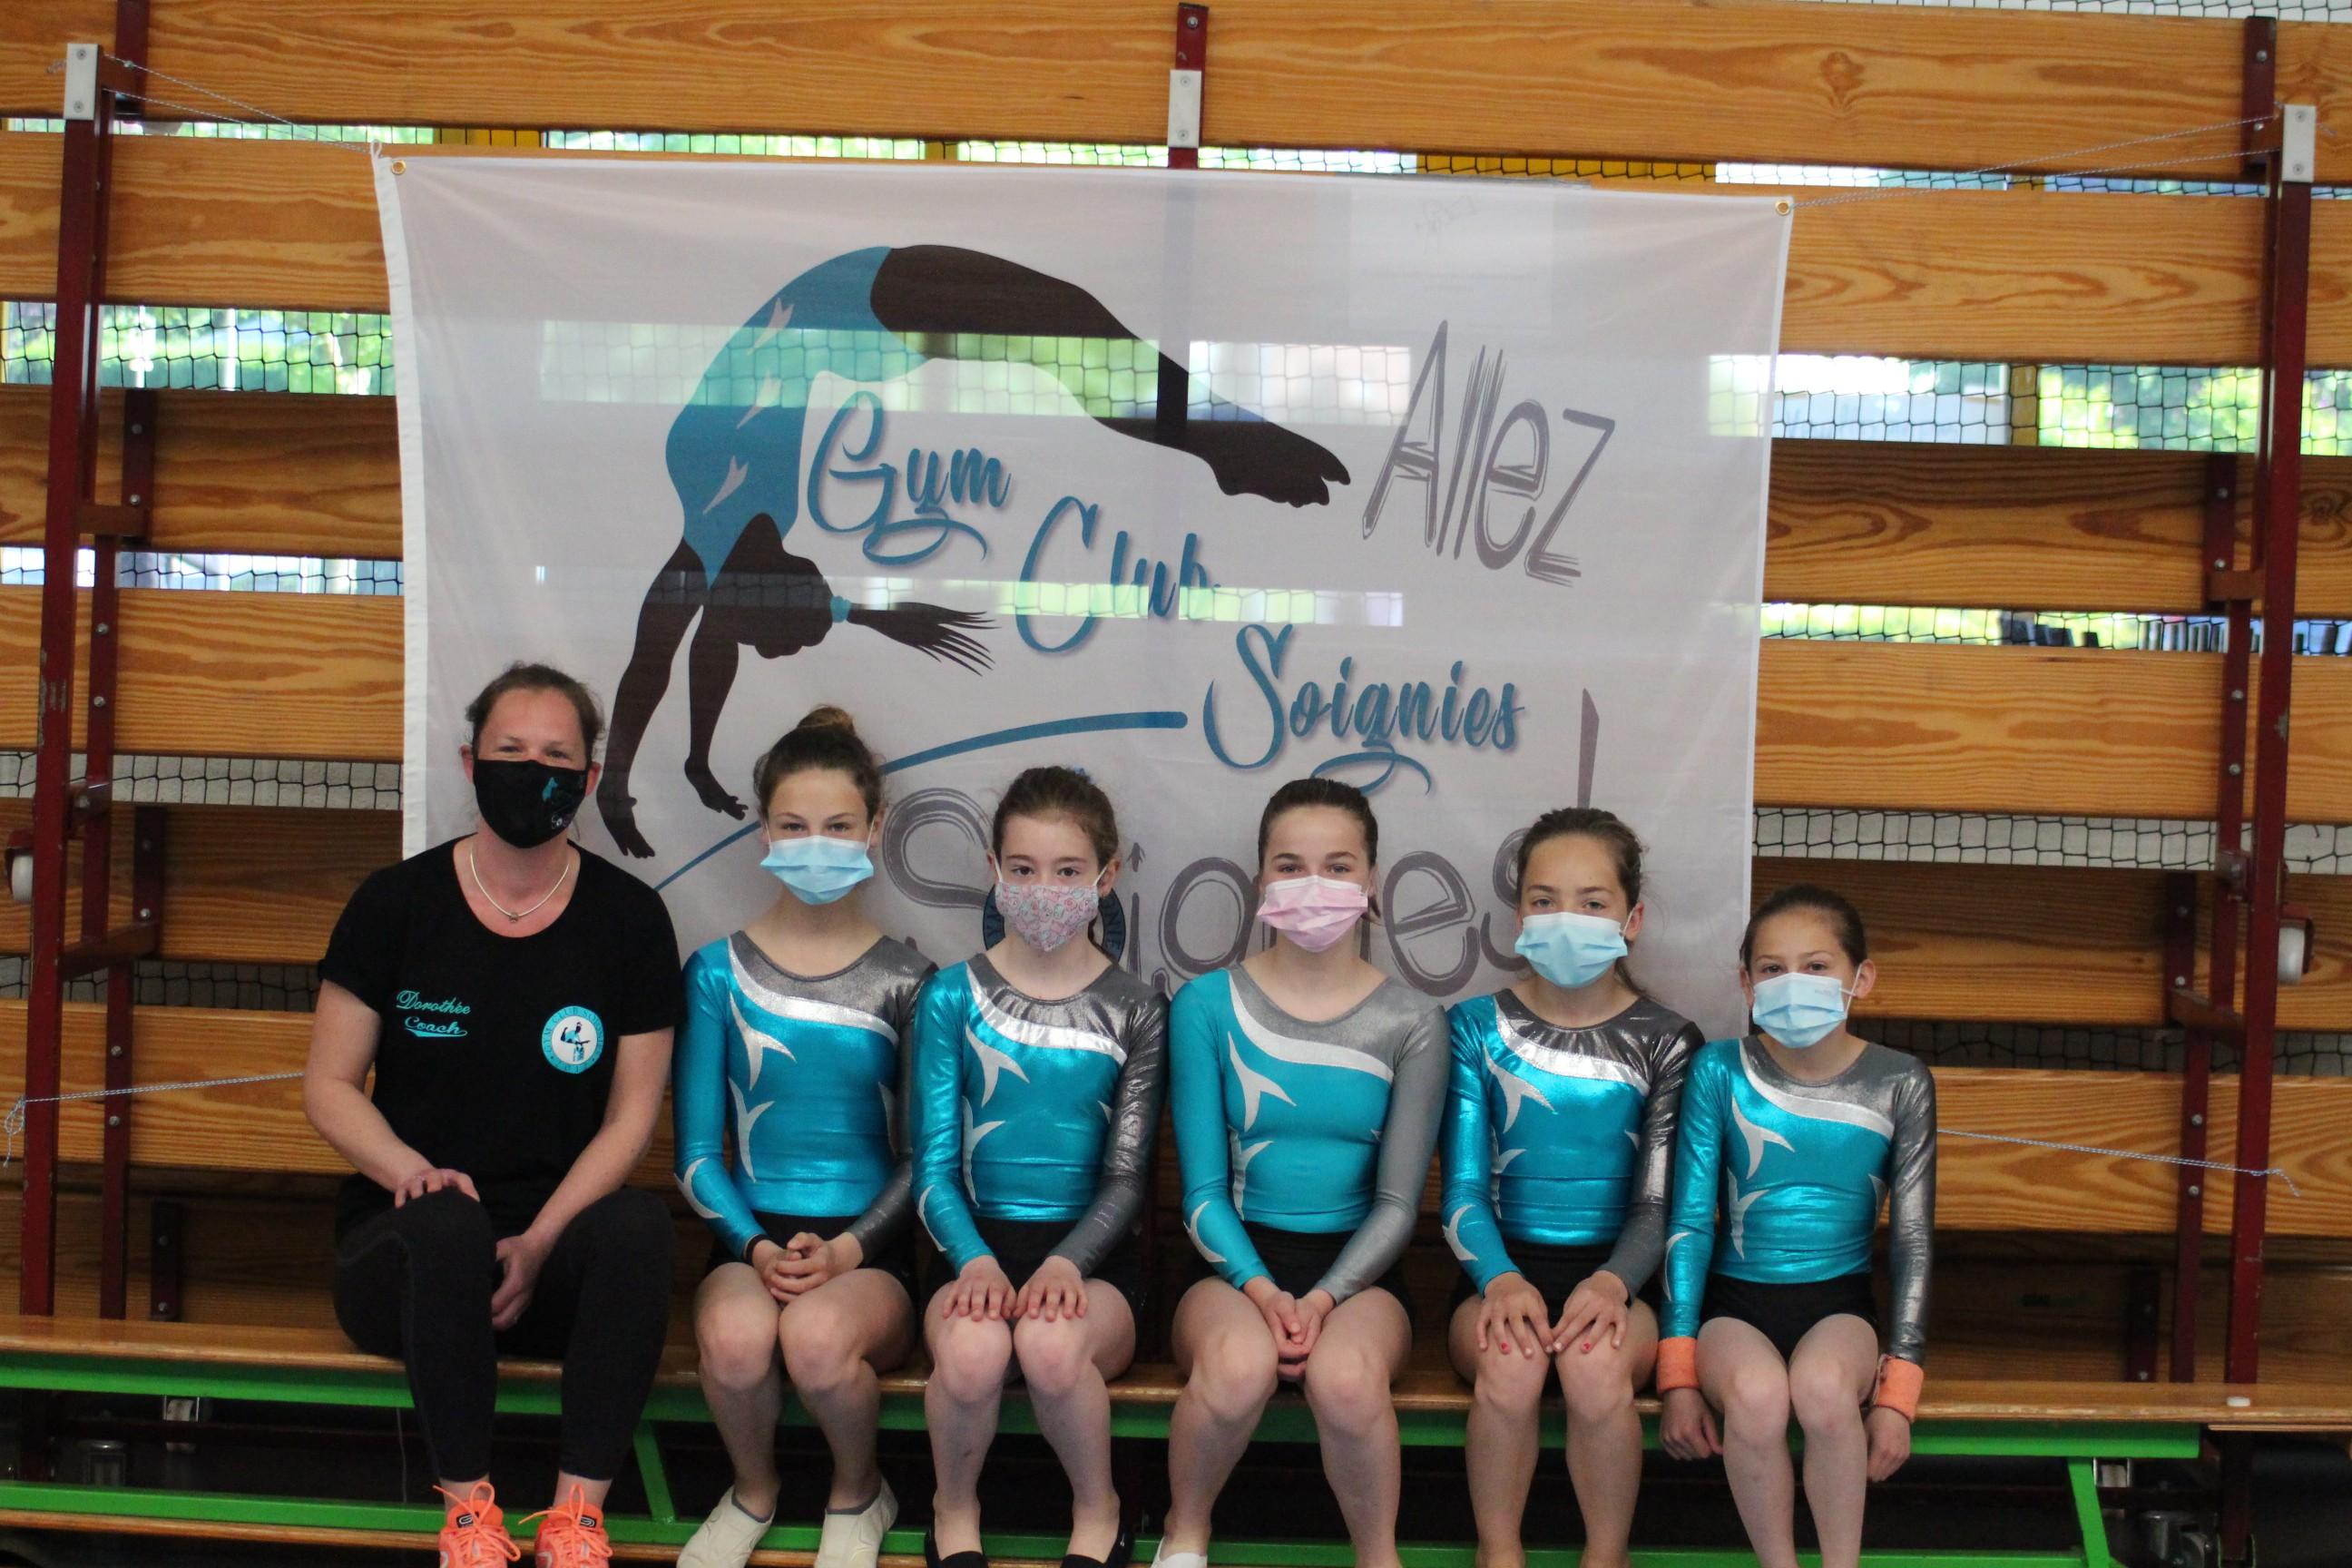 15 Compétitions Div. 4 Challenge - Groupe Dorothée